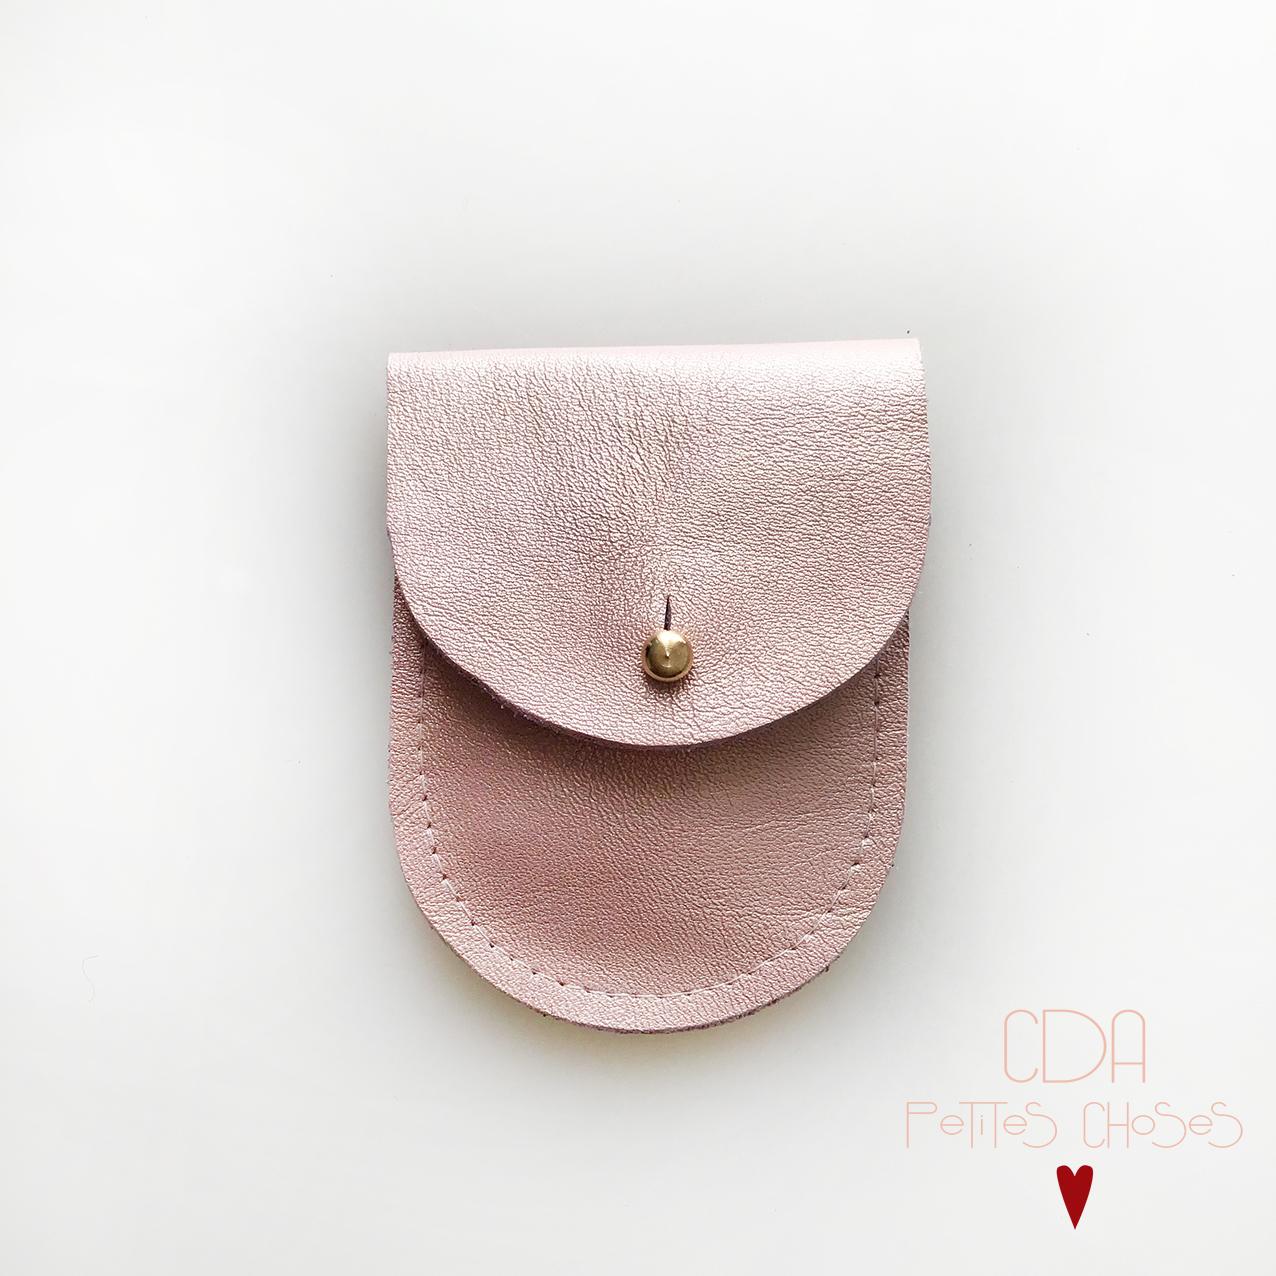 mini-pochette-en cuir rose-irise-CDA Petites Choses